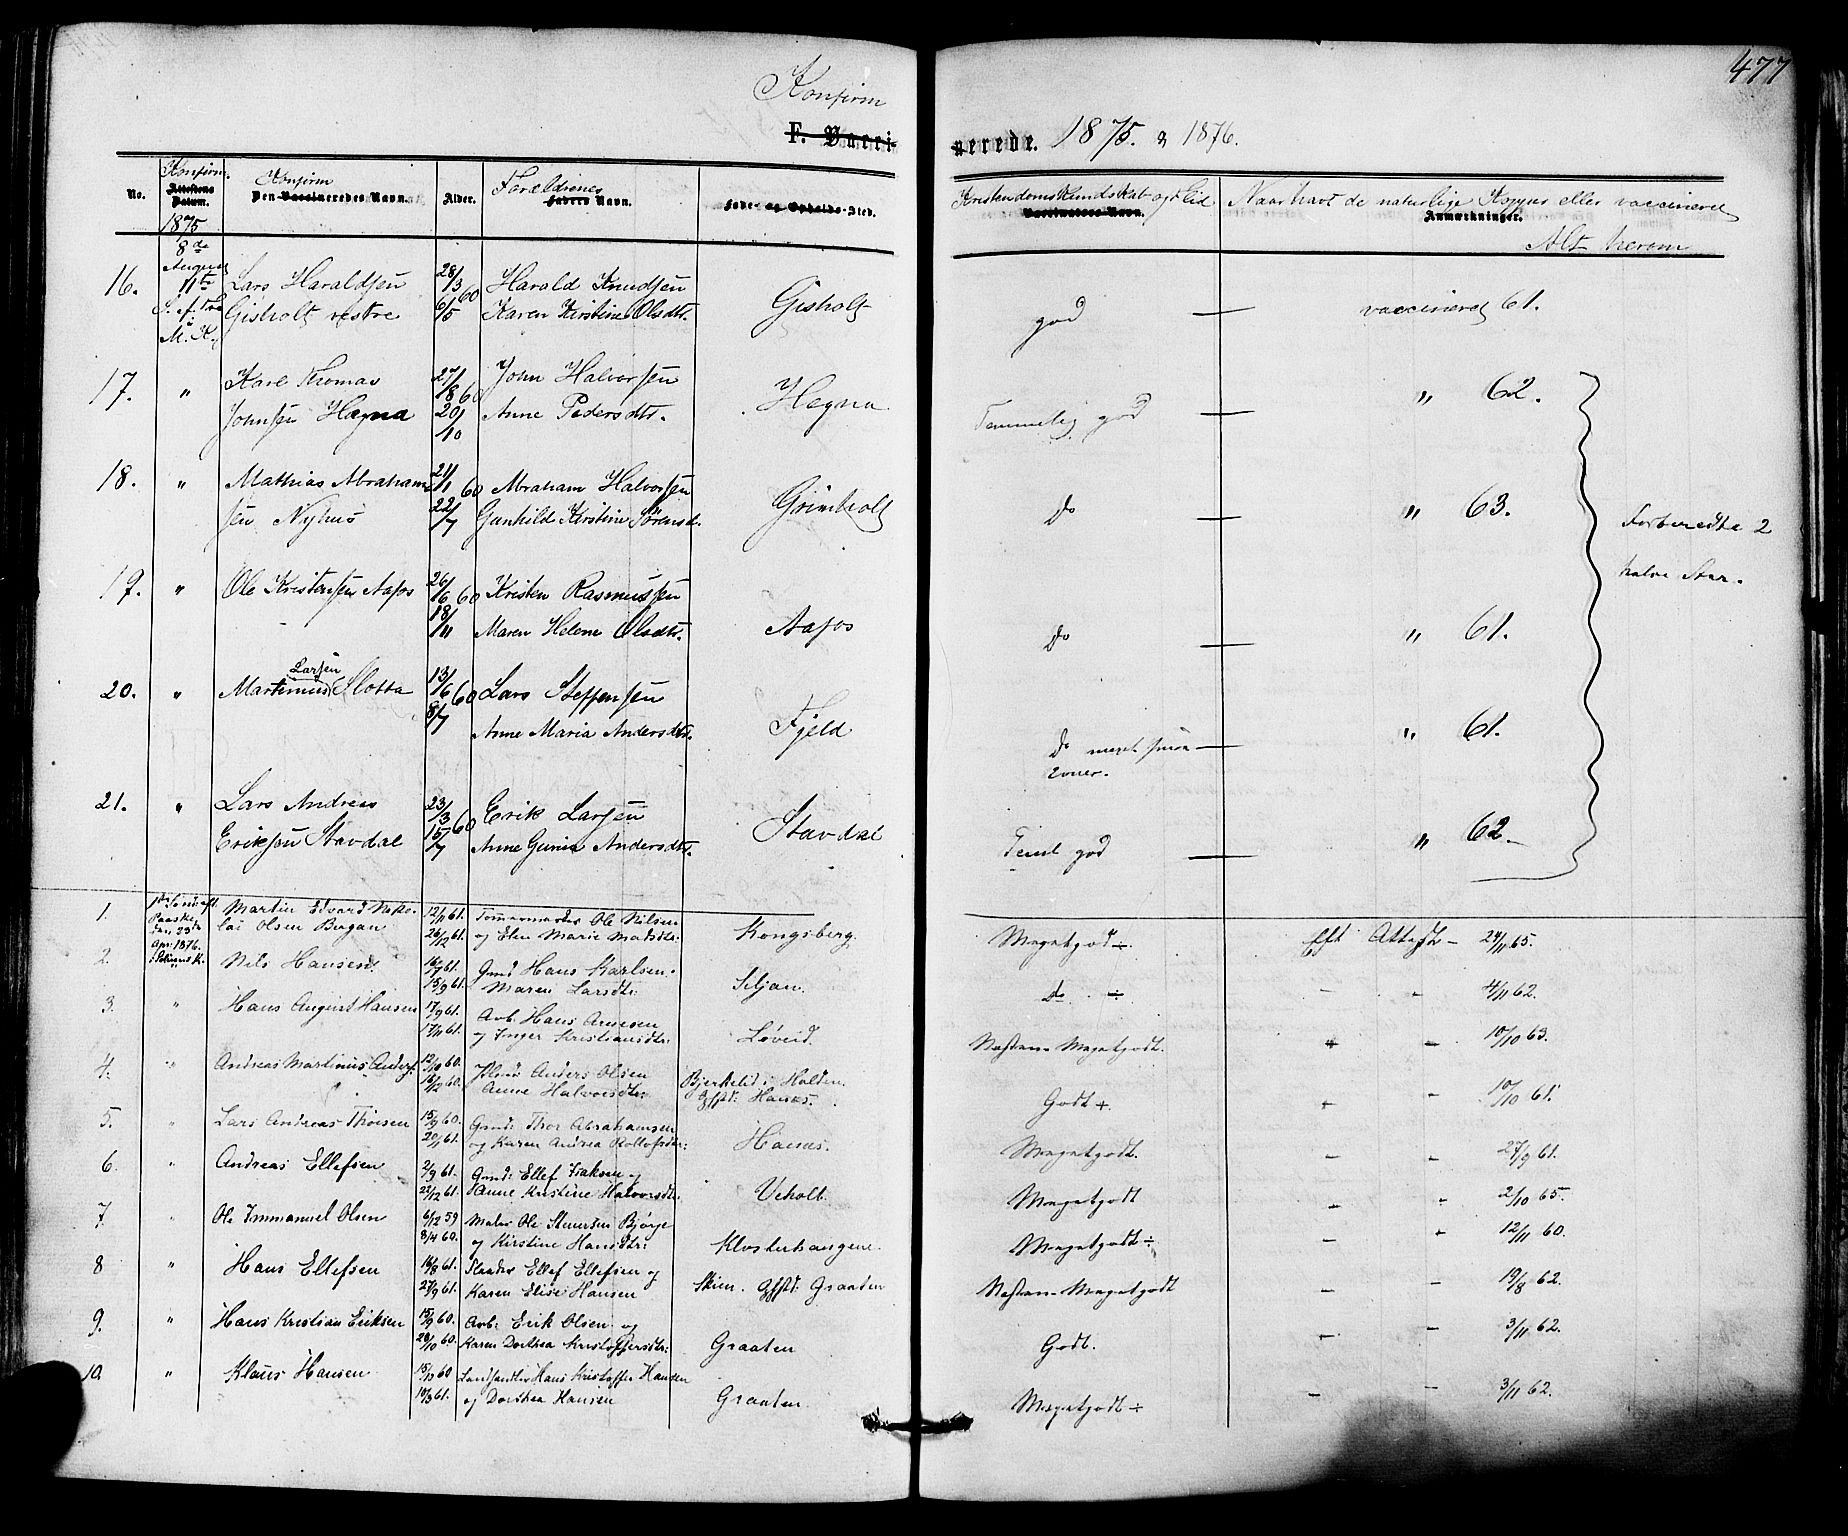 SAKO, Solum kirkebøker, F/Fa/L0008: Ministerialbok nr. I 8, 1865-1876, s. 477